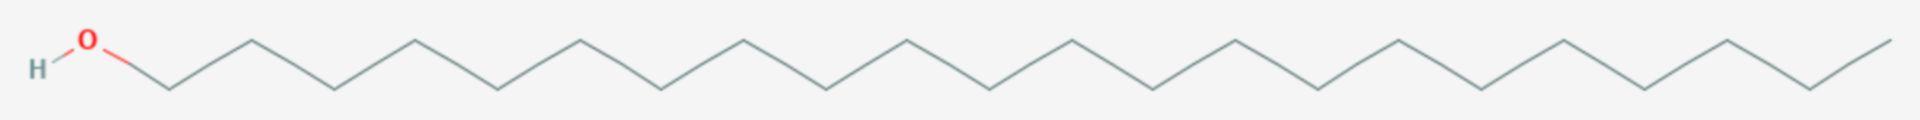 1-Docosanol (Strukturformel)